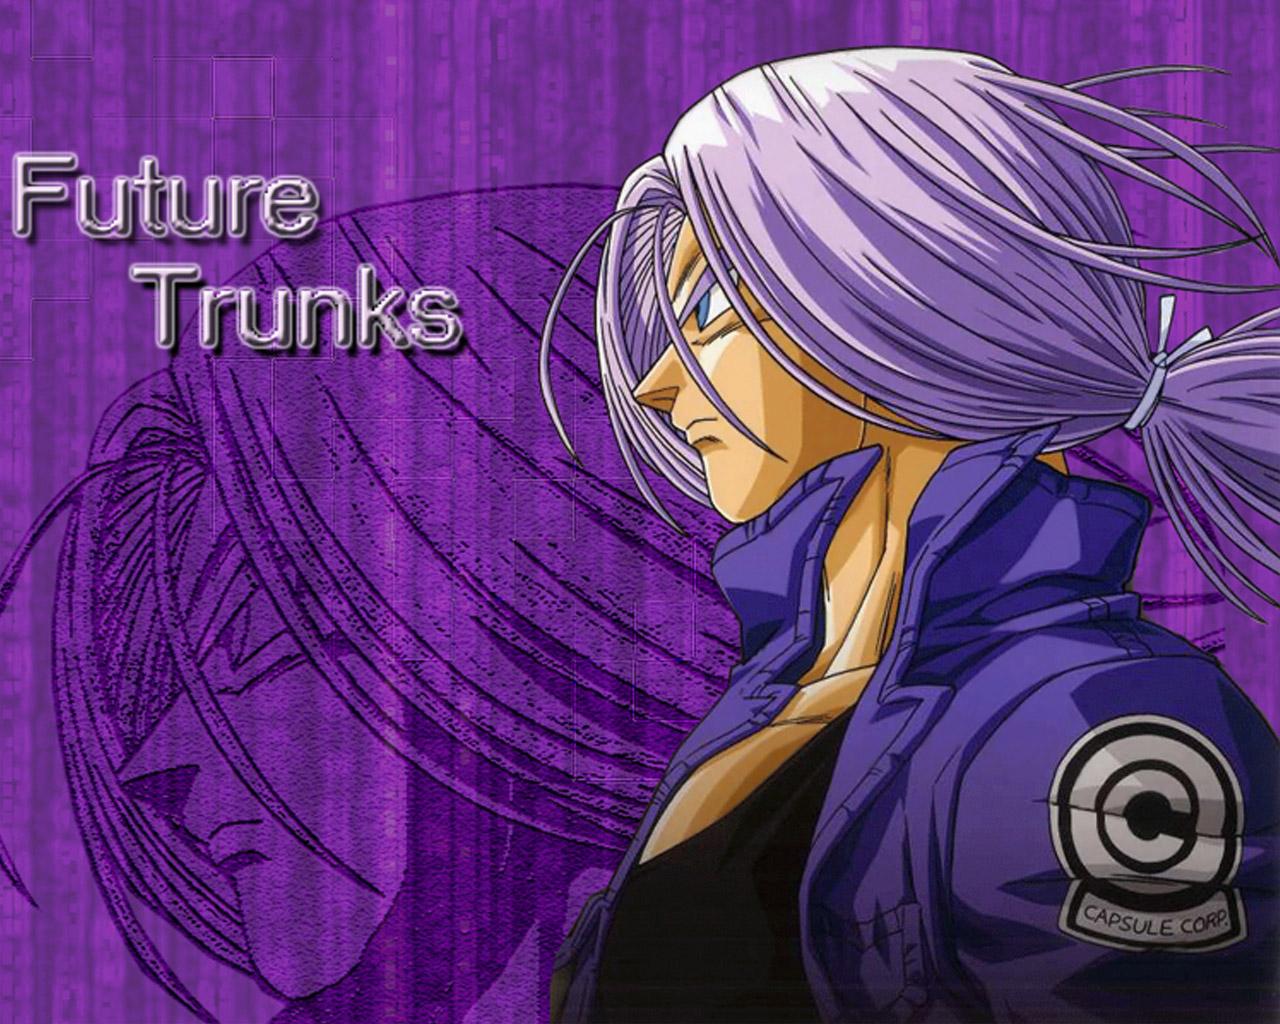 Mirai Trunks trunks 24615155 1280 1024jpg 1280x1024